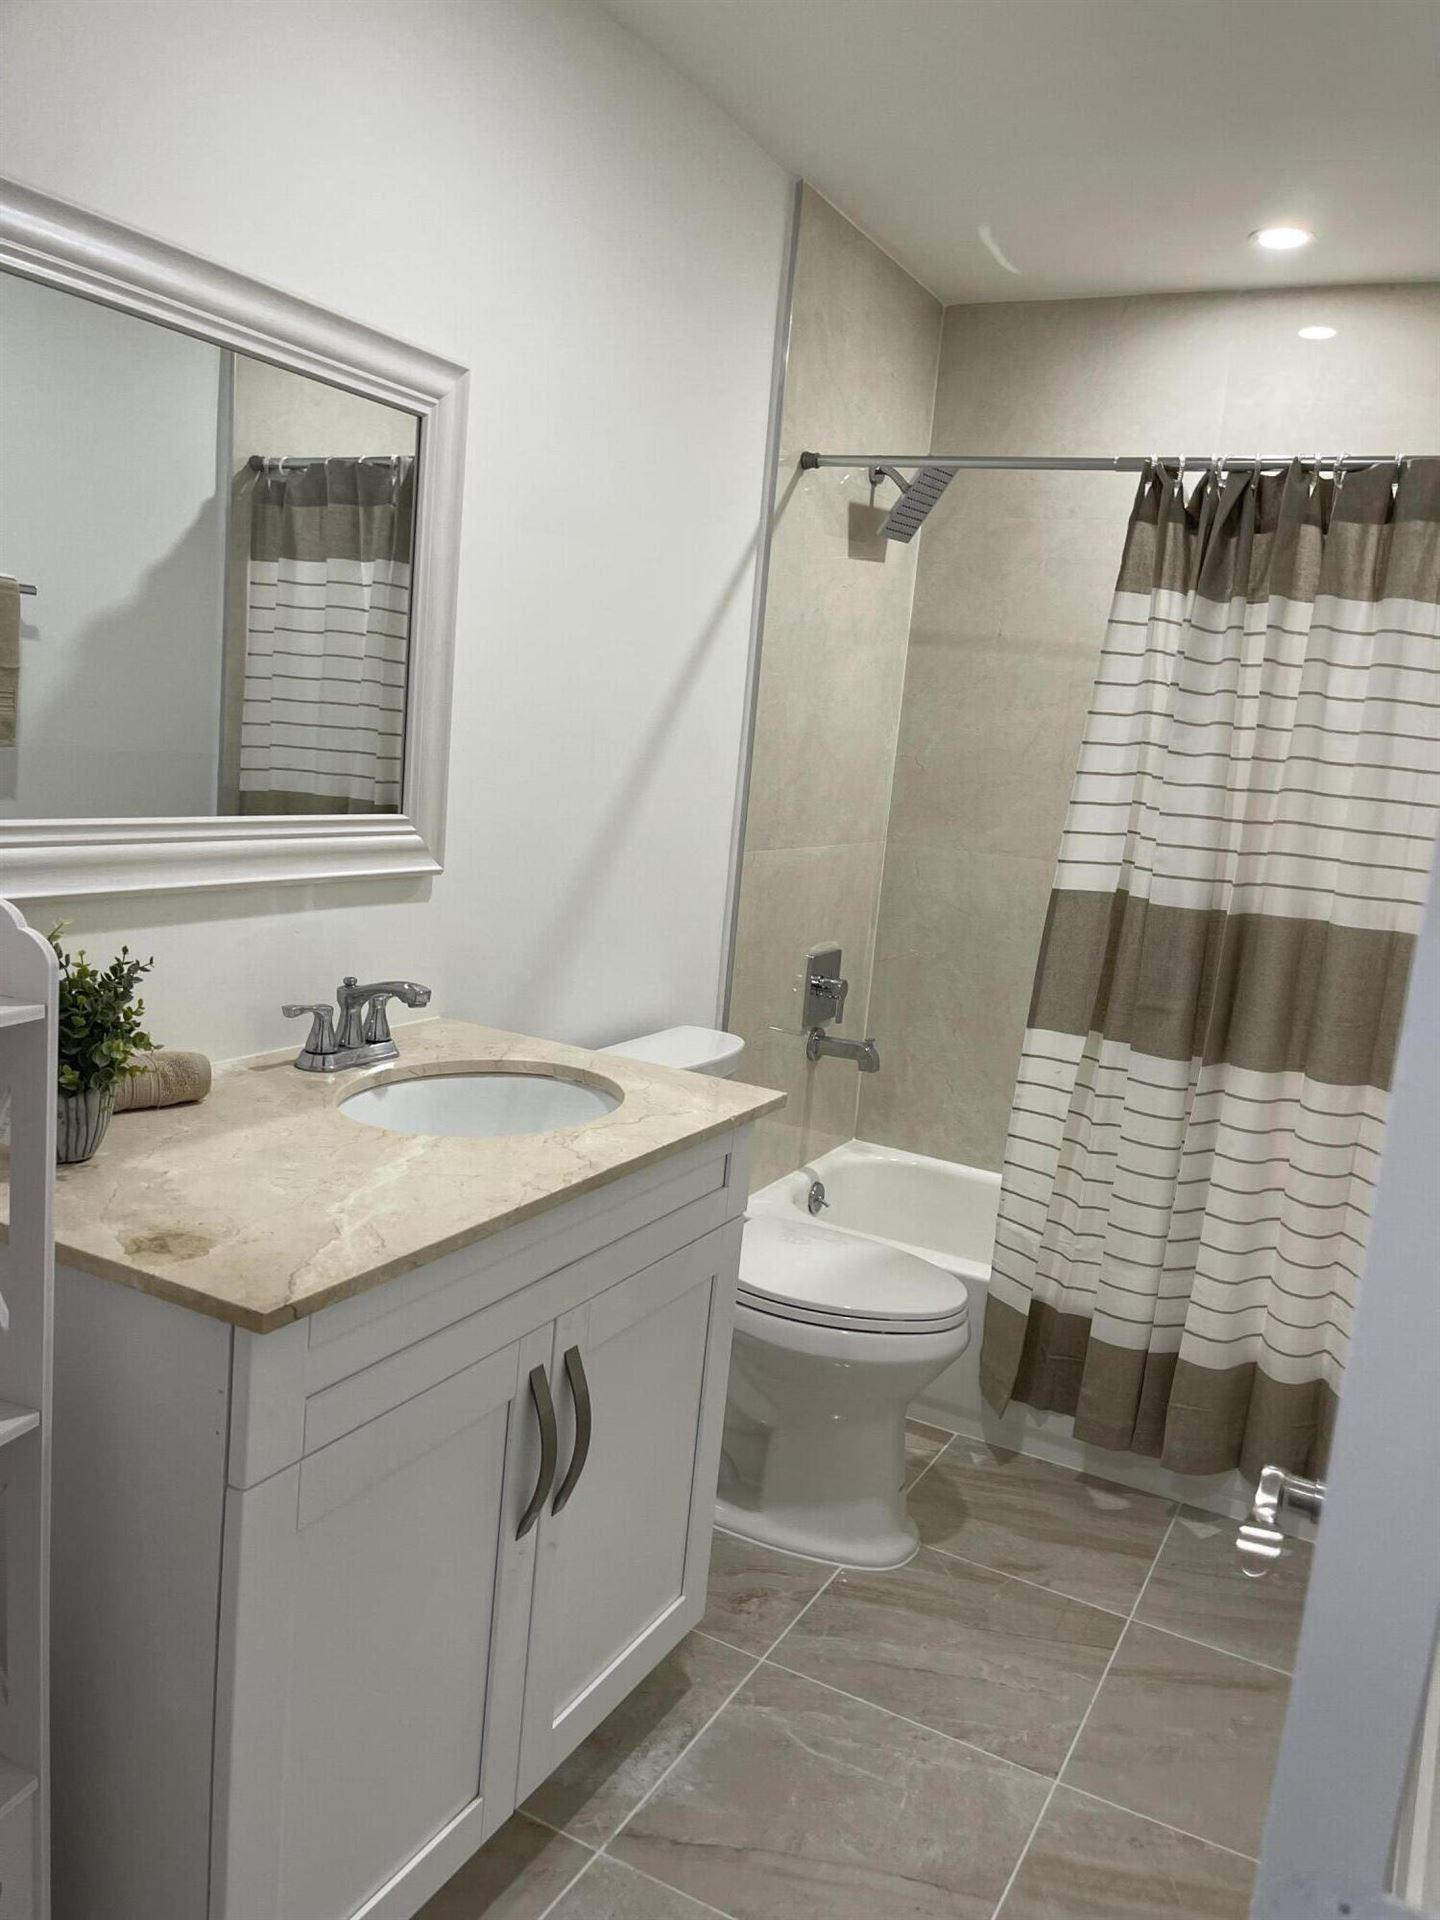 5674 NW 195 Terrace, Miami Gardens, FL 33055 - MLS#: RX-10752561